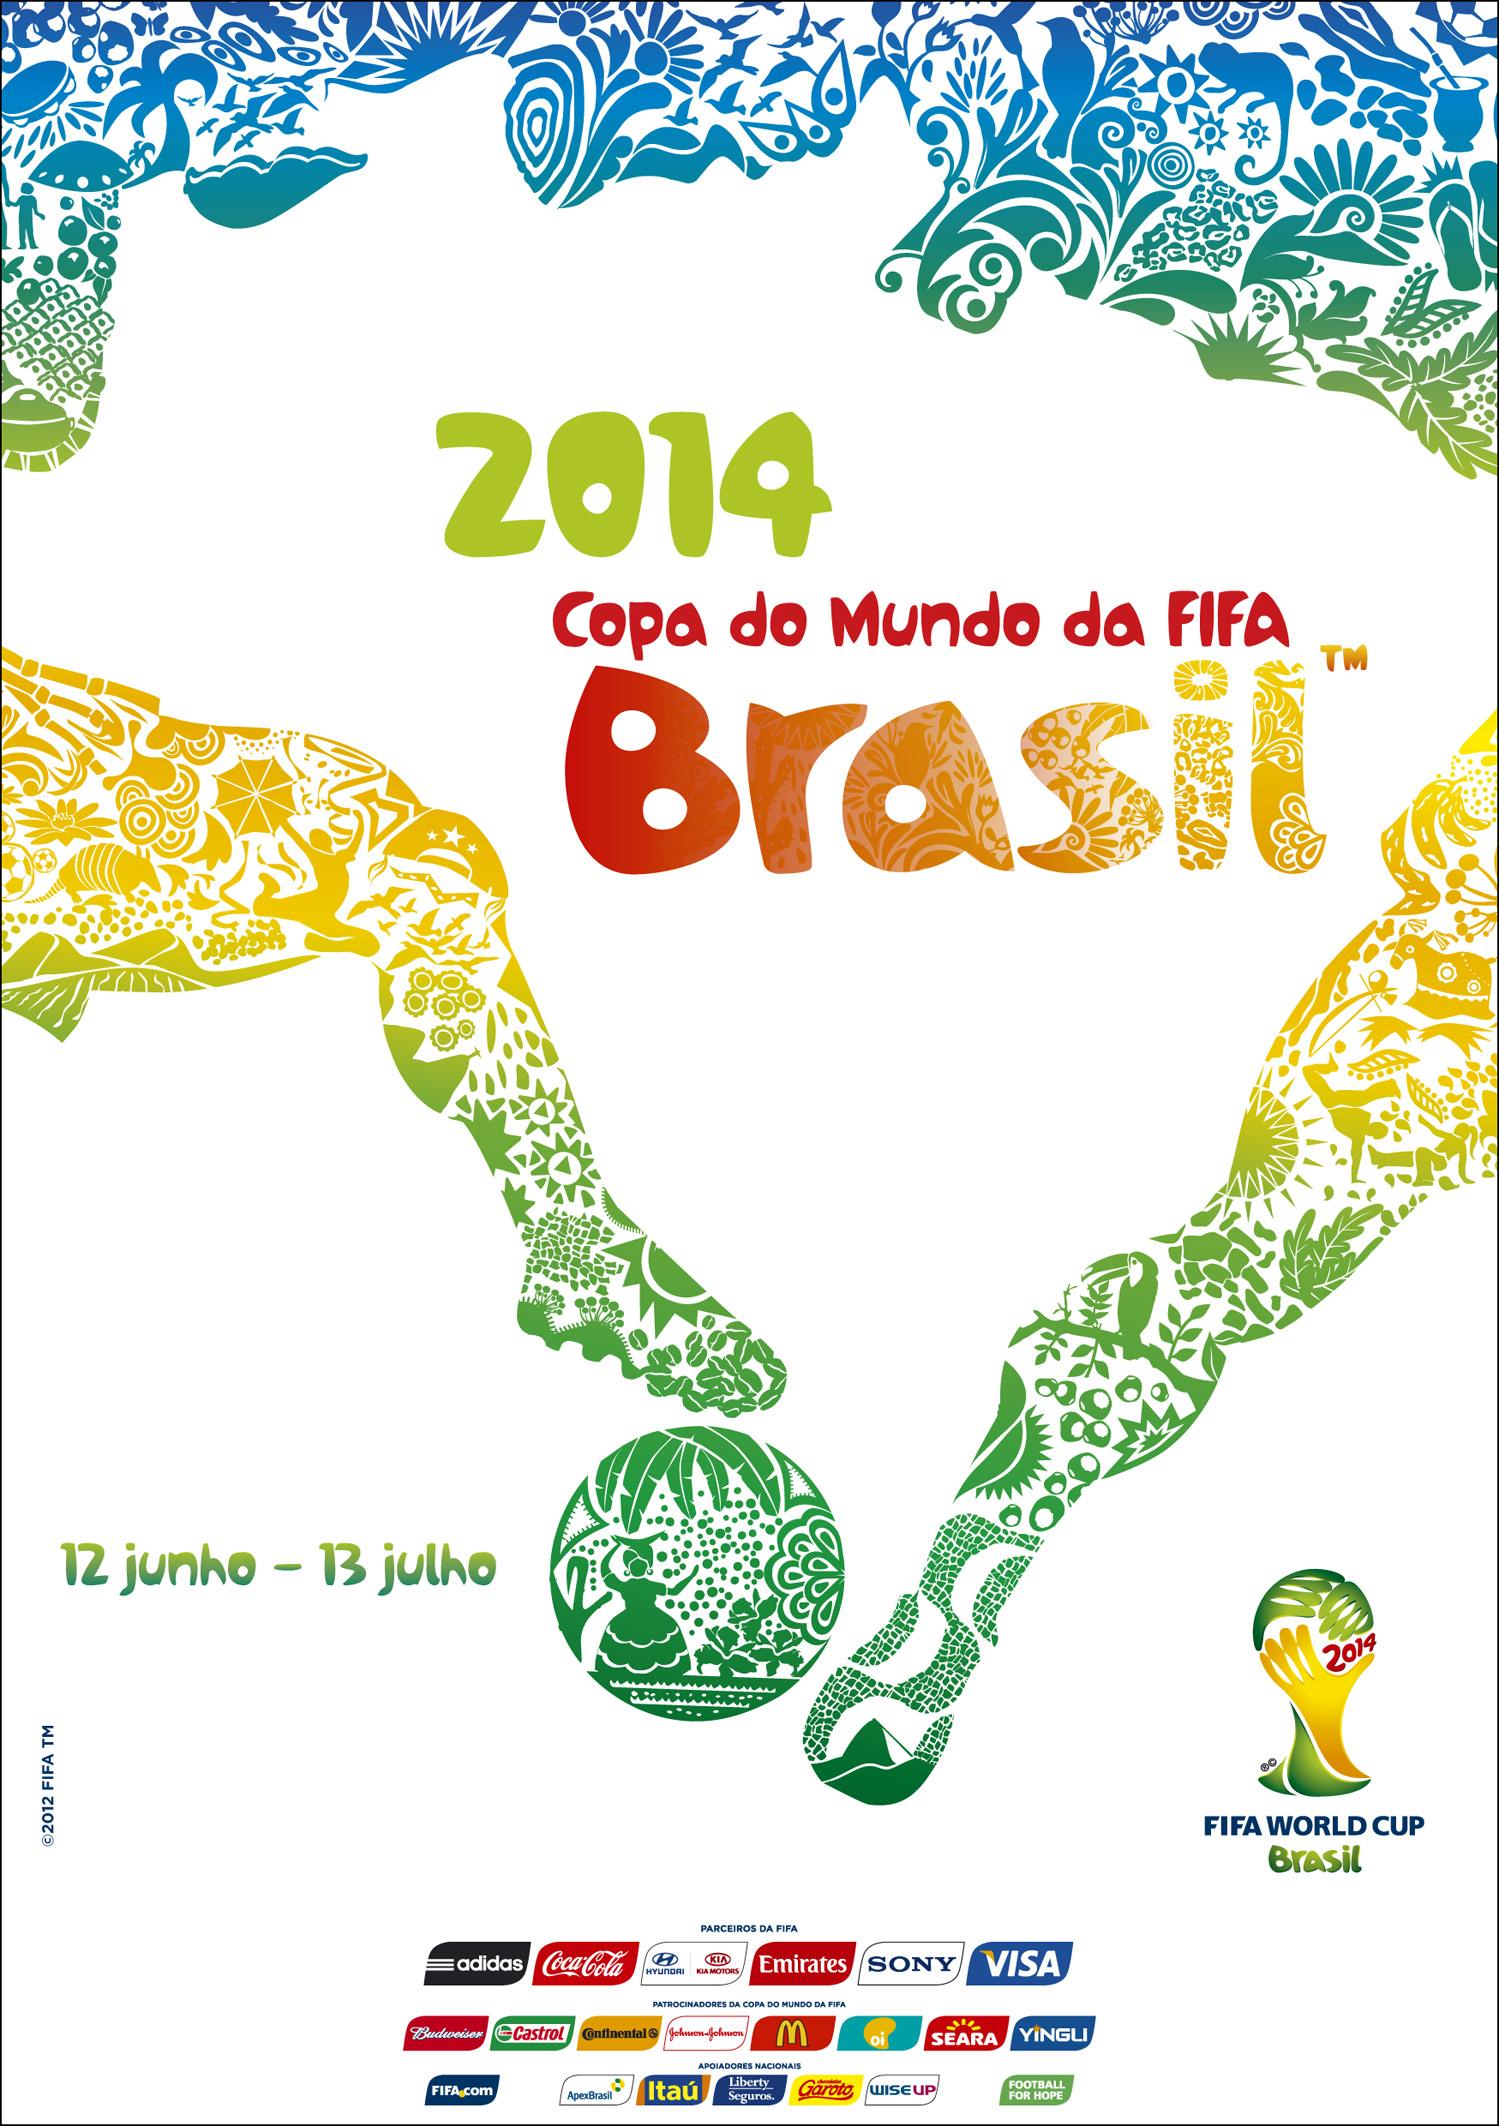 #vaiterCopaSim #BrasilCampeão #RumoaoHexa